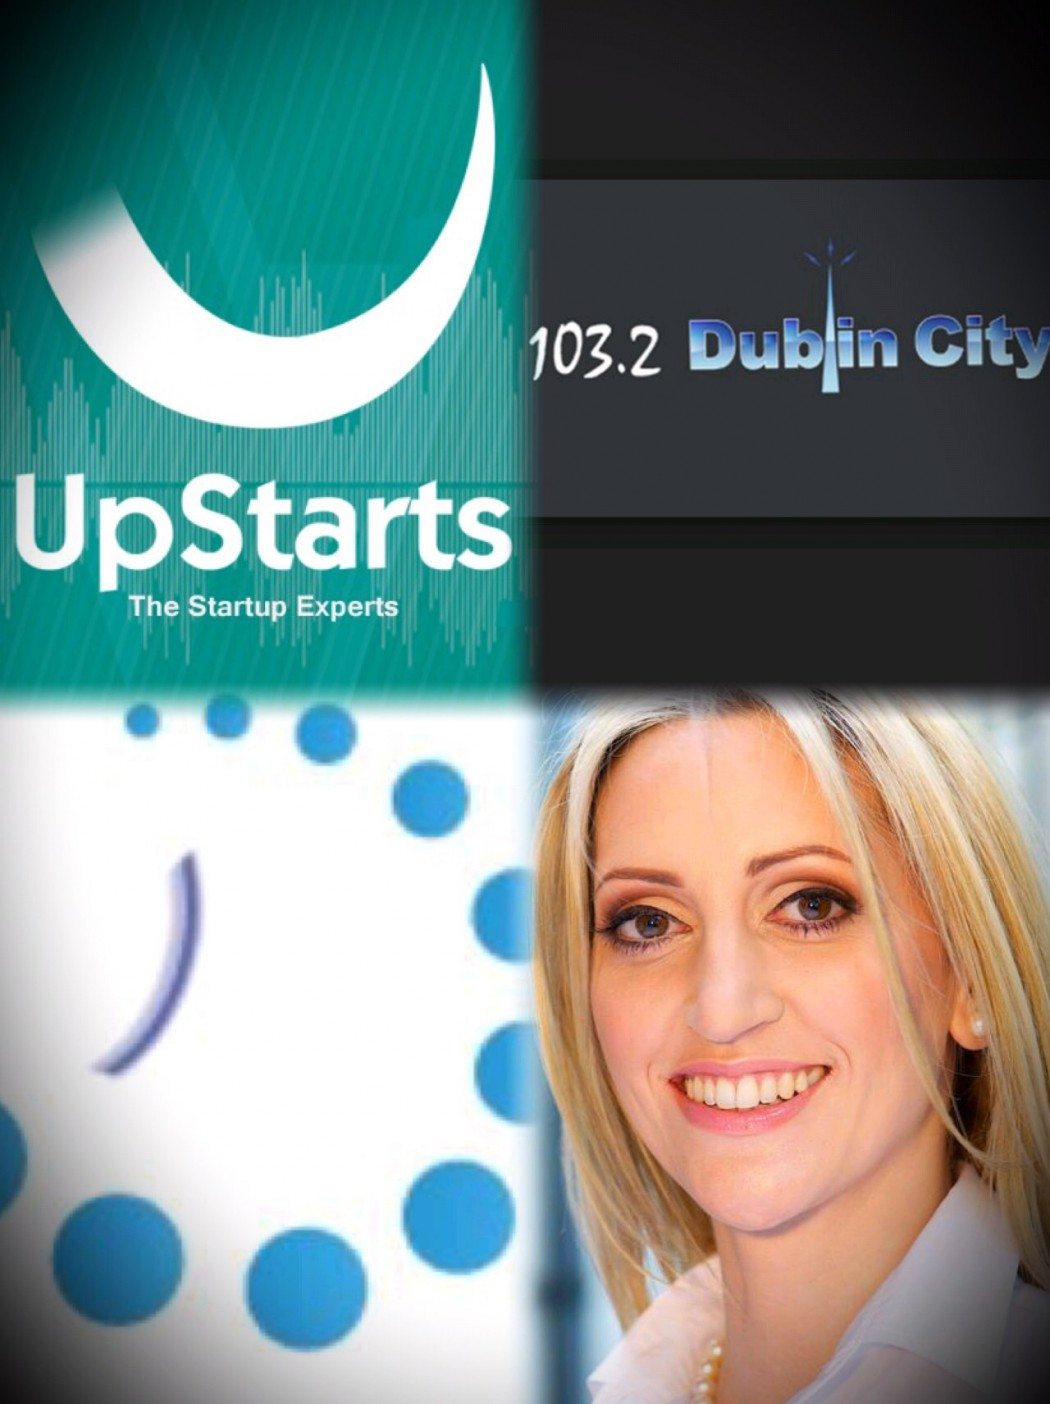 http://www.upstarts.ie/wp-content/uploads/2015/03/IMG_0858-1050x1404.jpg